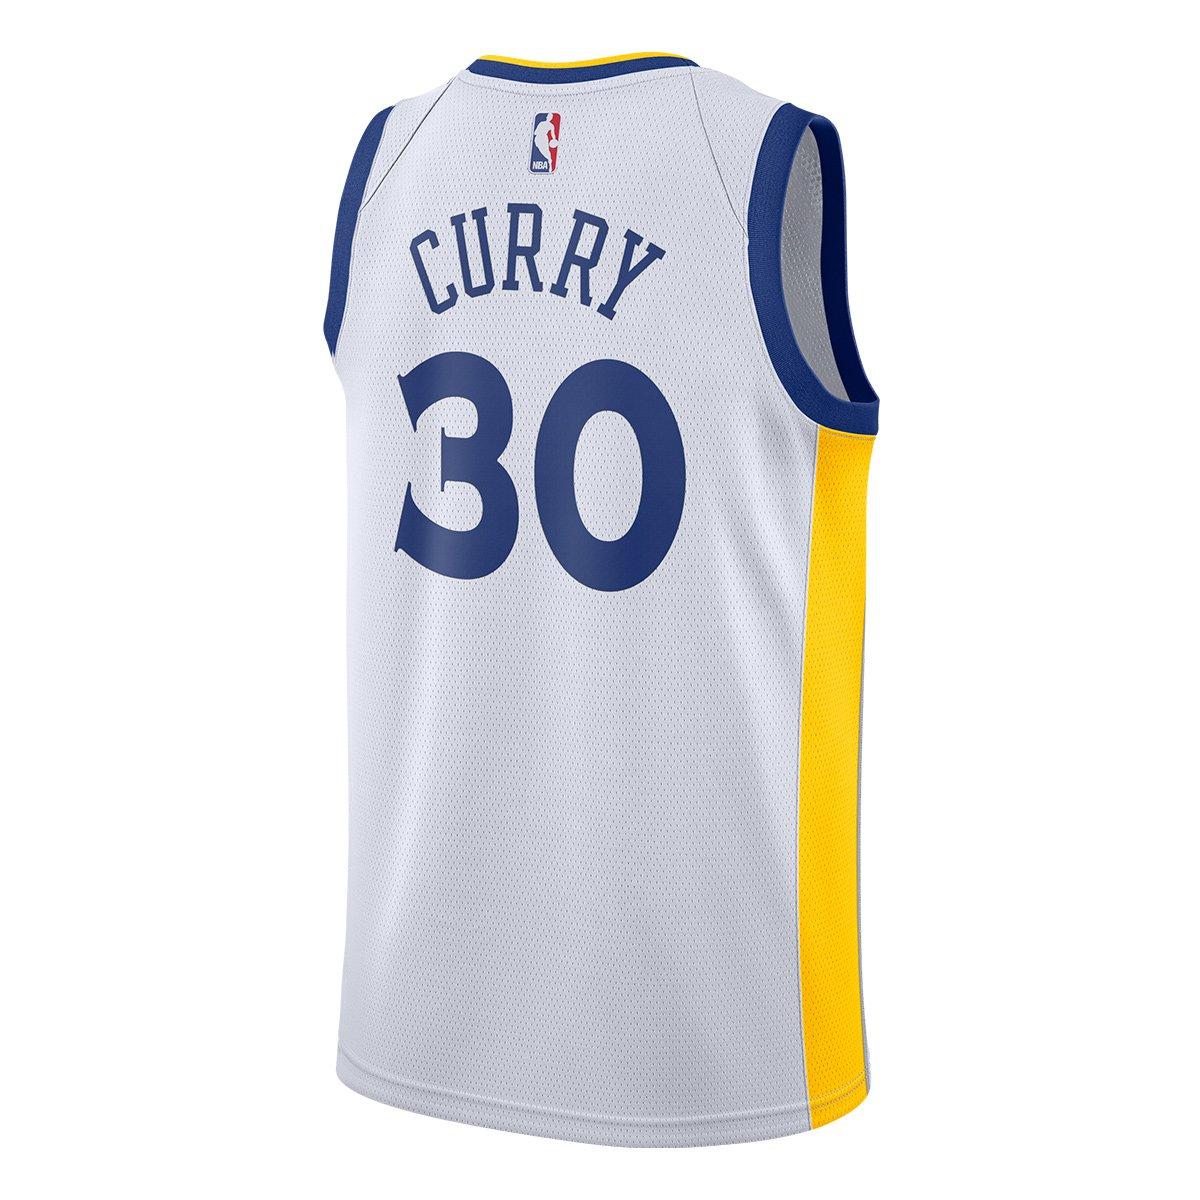 3803e2dfd0 Regata Nike Swingman JSY Home Golden State Warriors - Stephen Curry ...